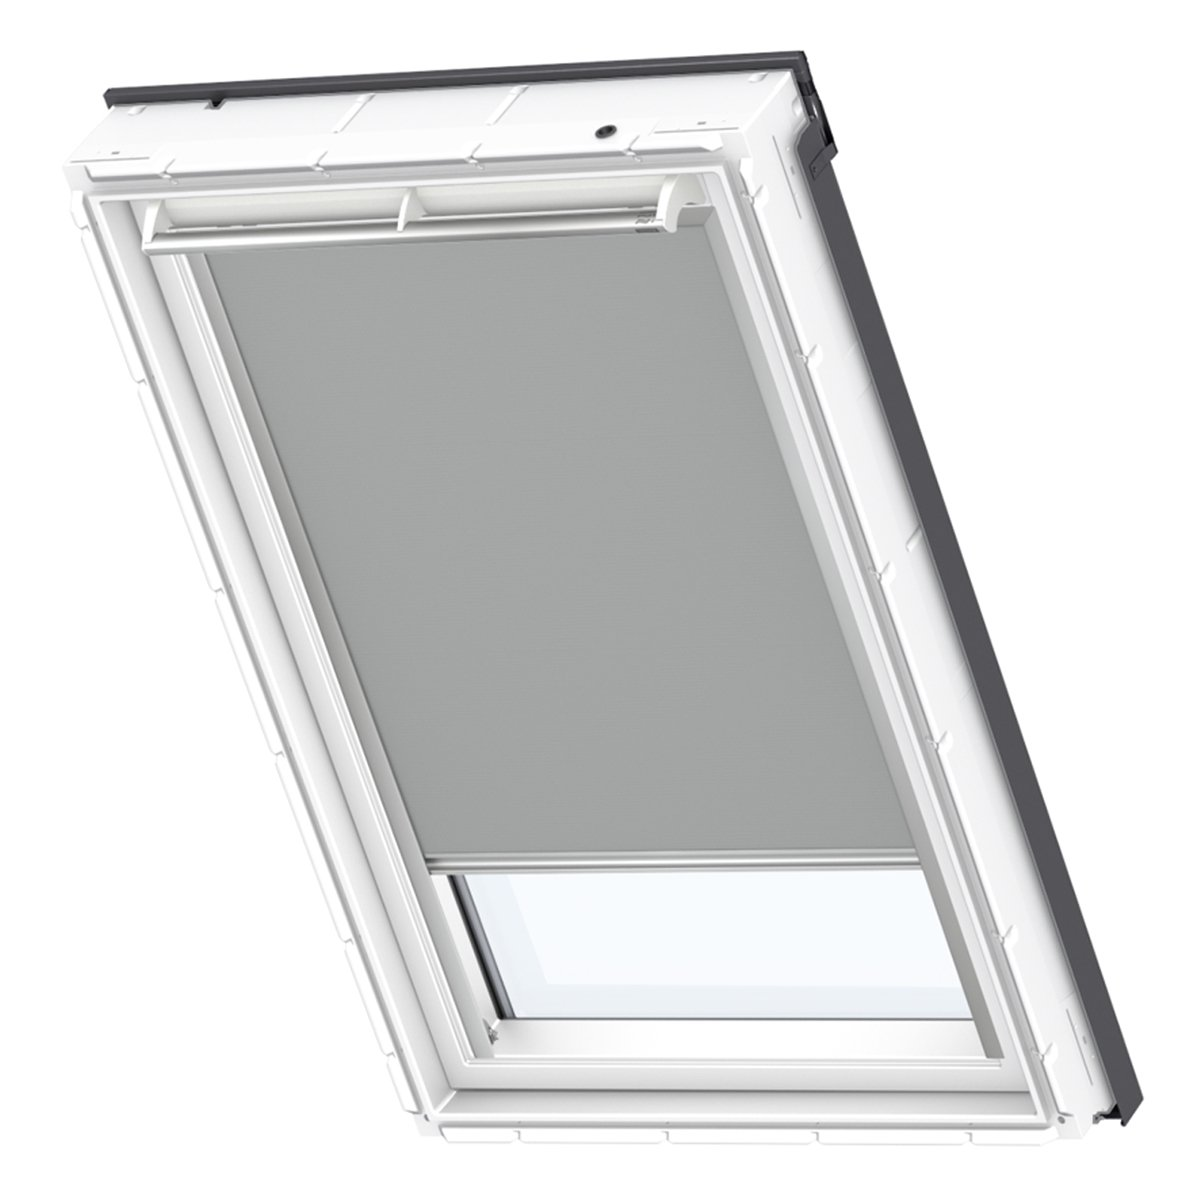 VELUX Original Verdunkelungrollo Dachfenster, PK08, Uni Grau